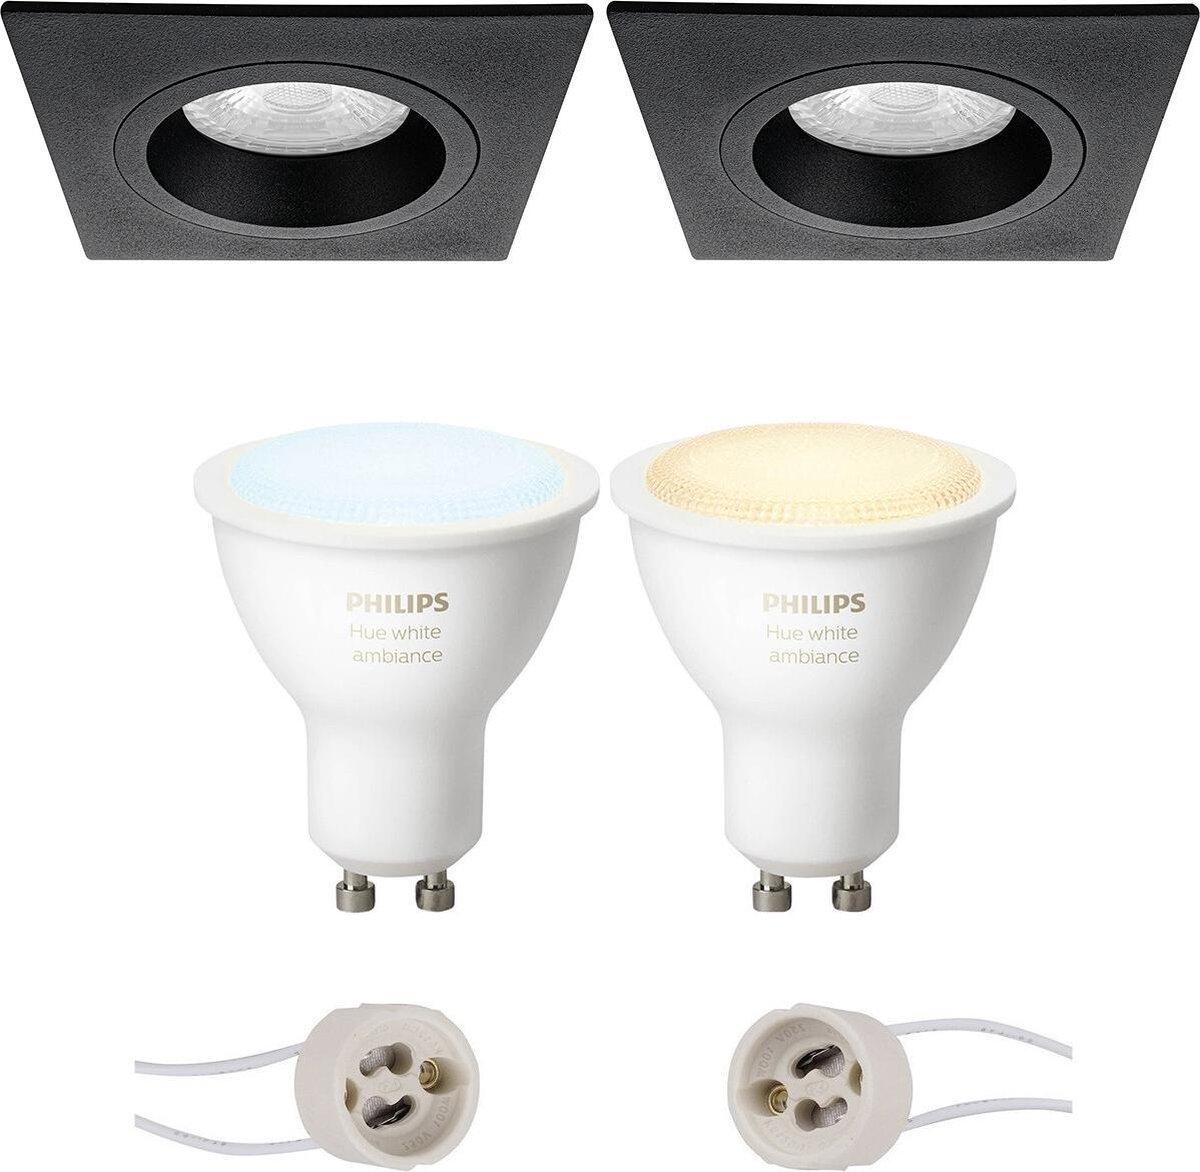 PHILIPS HUE - LED Spot Set GU10 - White Ambiance - Bluetooth - Proma Rodos Pro - Inbouw Vierkant - Mat Zwart - 93mm